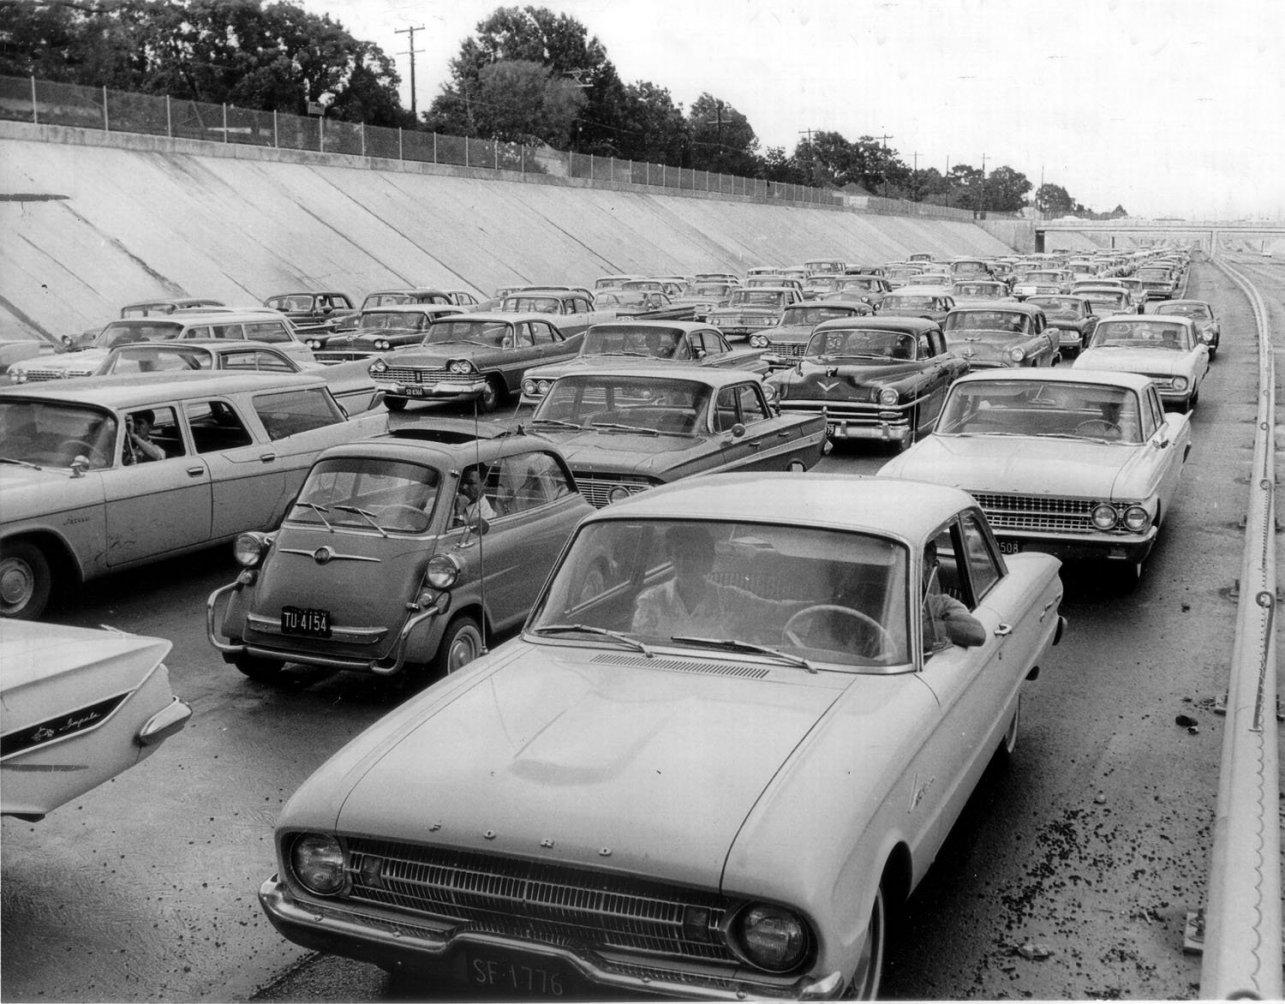 us59_trench_traffic_jam_1962.jpg